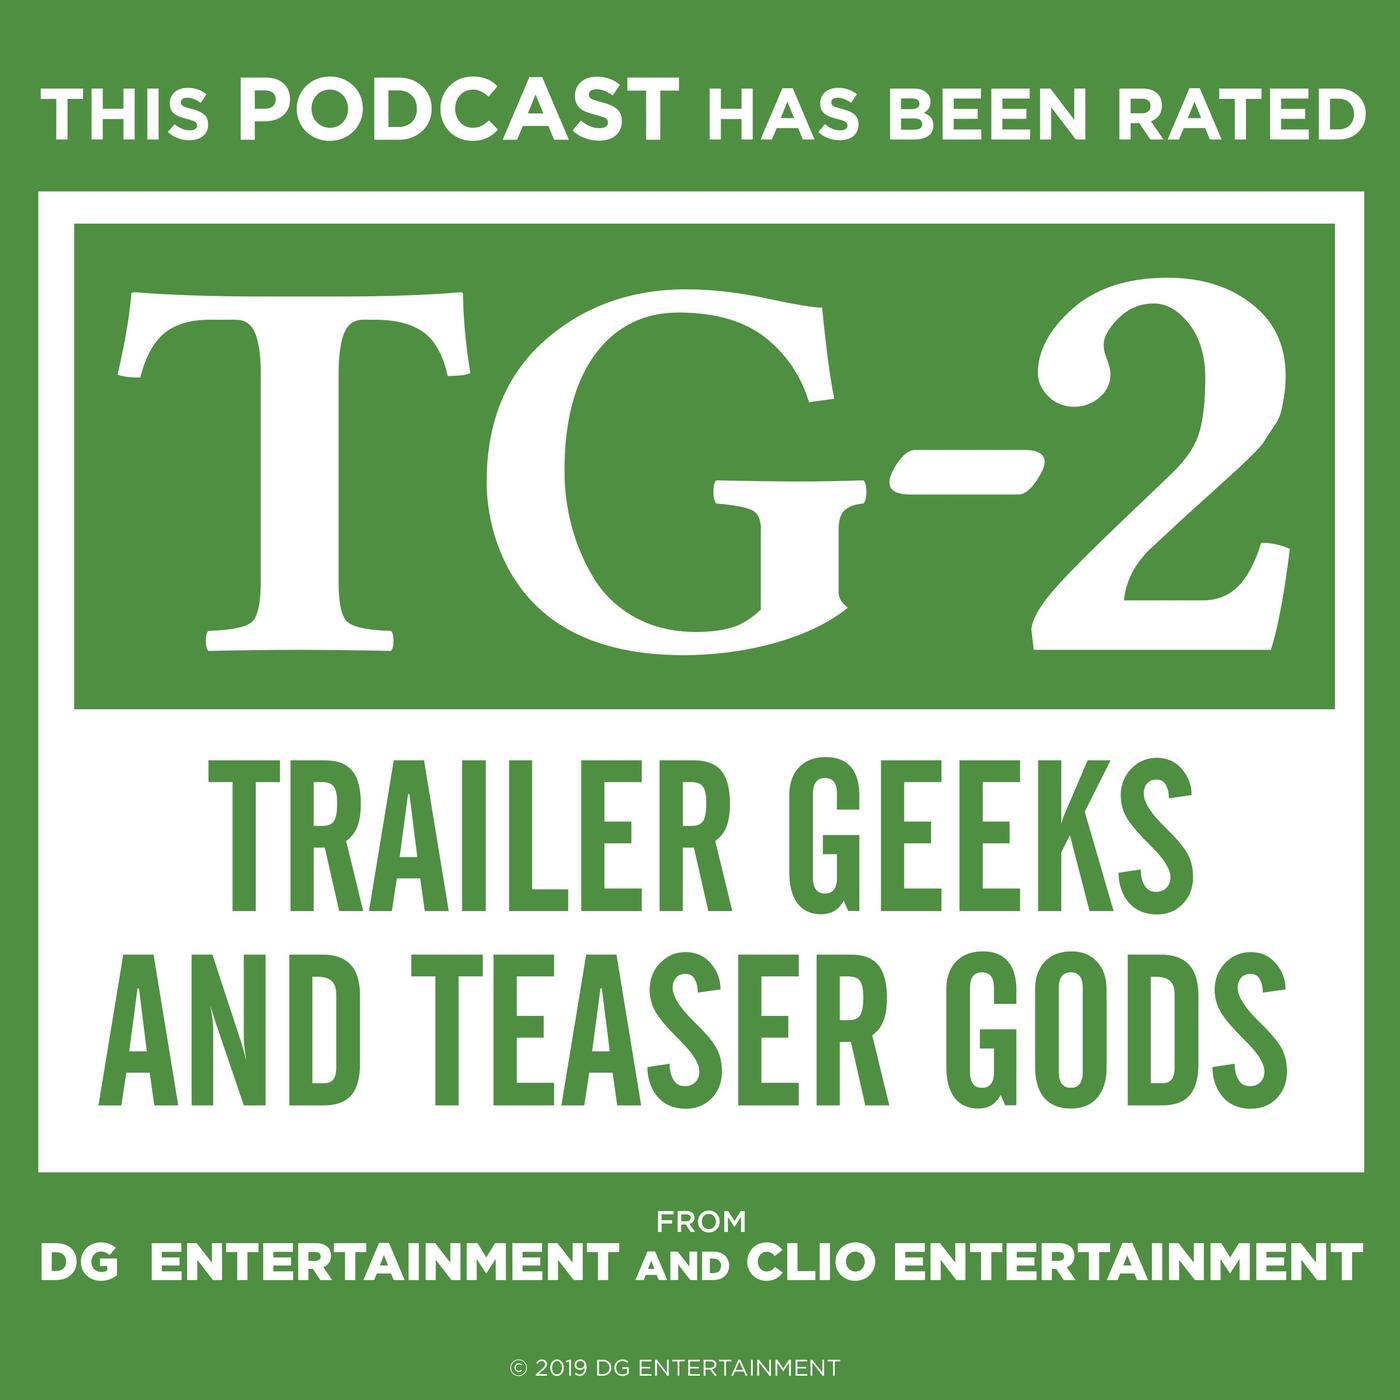 Trailer Geeks and Teaser Gods (podcast) - DG Entertainment